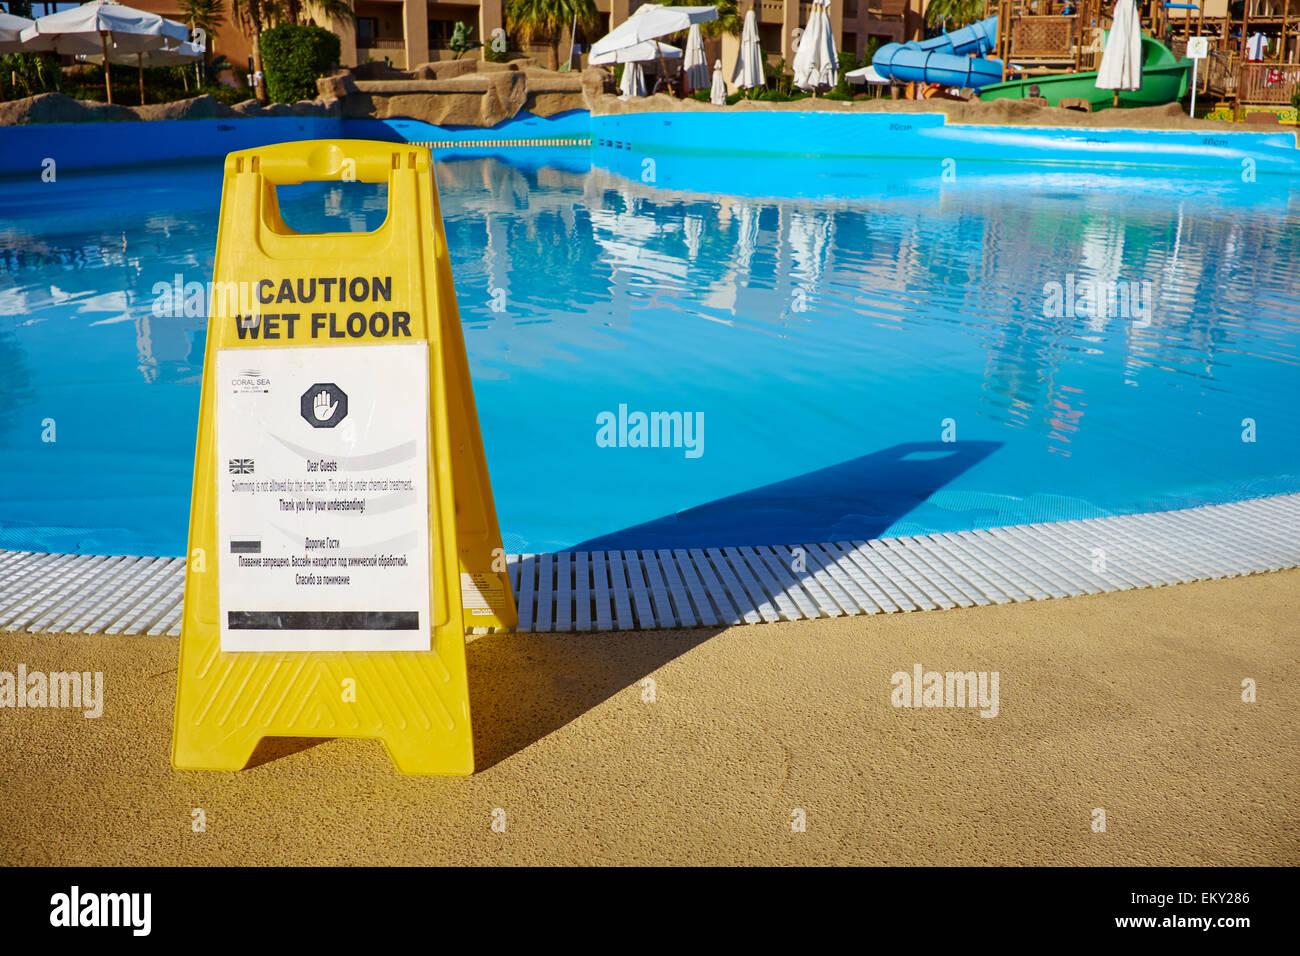 Coral Sea Aqua Club Resort Egypt Choice Image Diagram Writing Sample Ideas And Guide